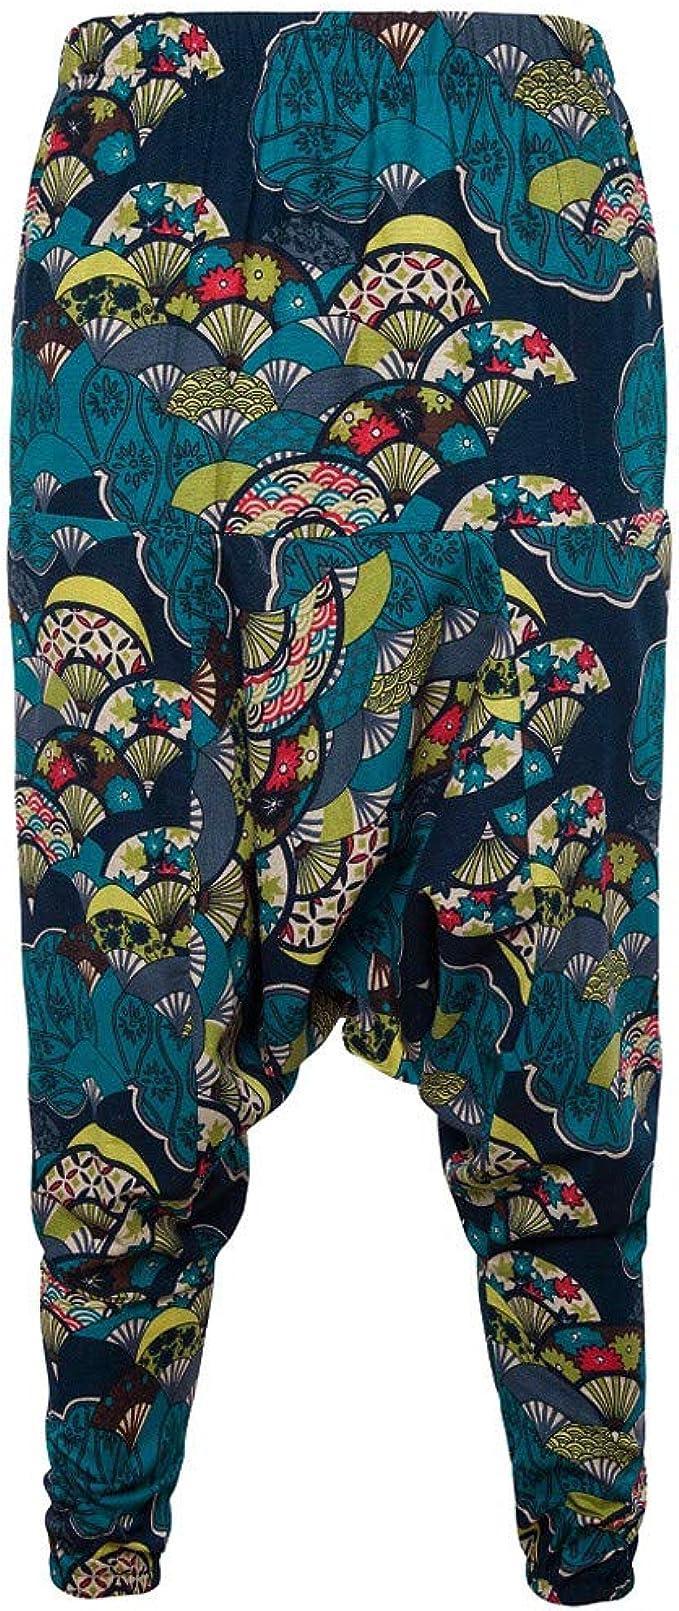 Cocoty-store Pantalones 2019 Pantalones de chándal elásticos para ...